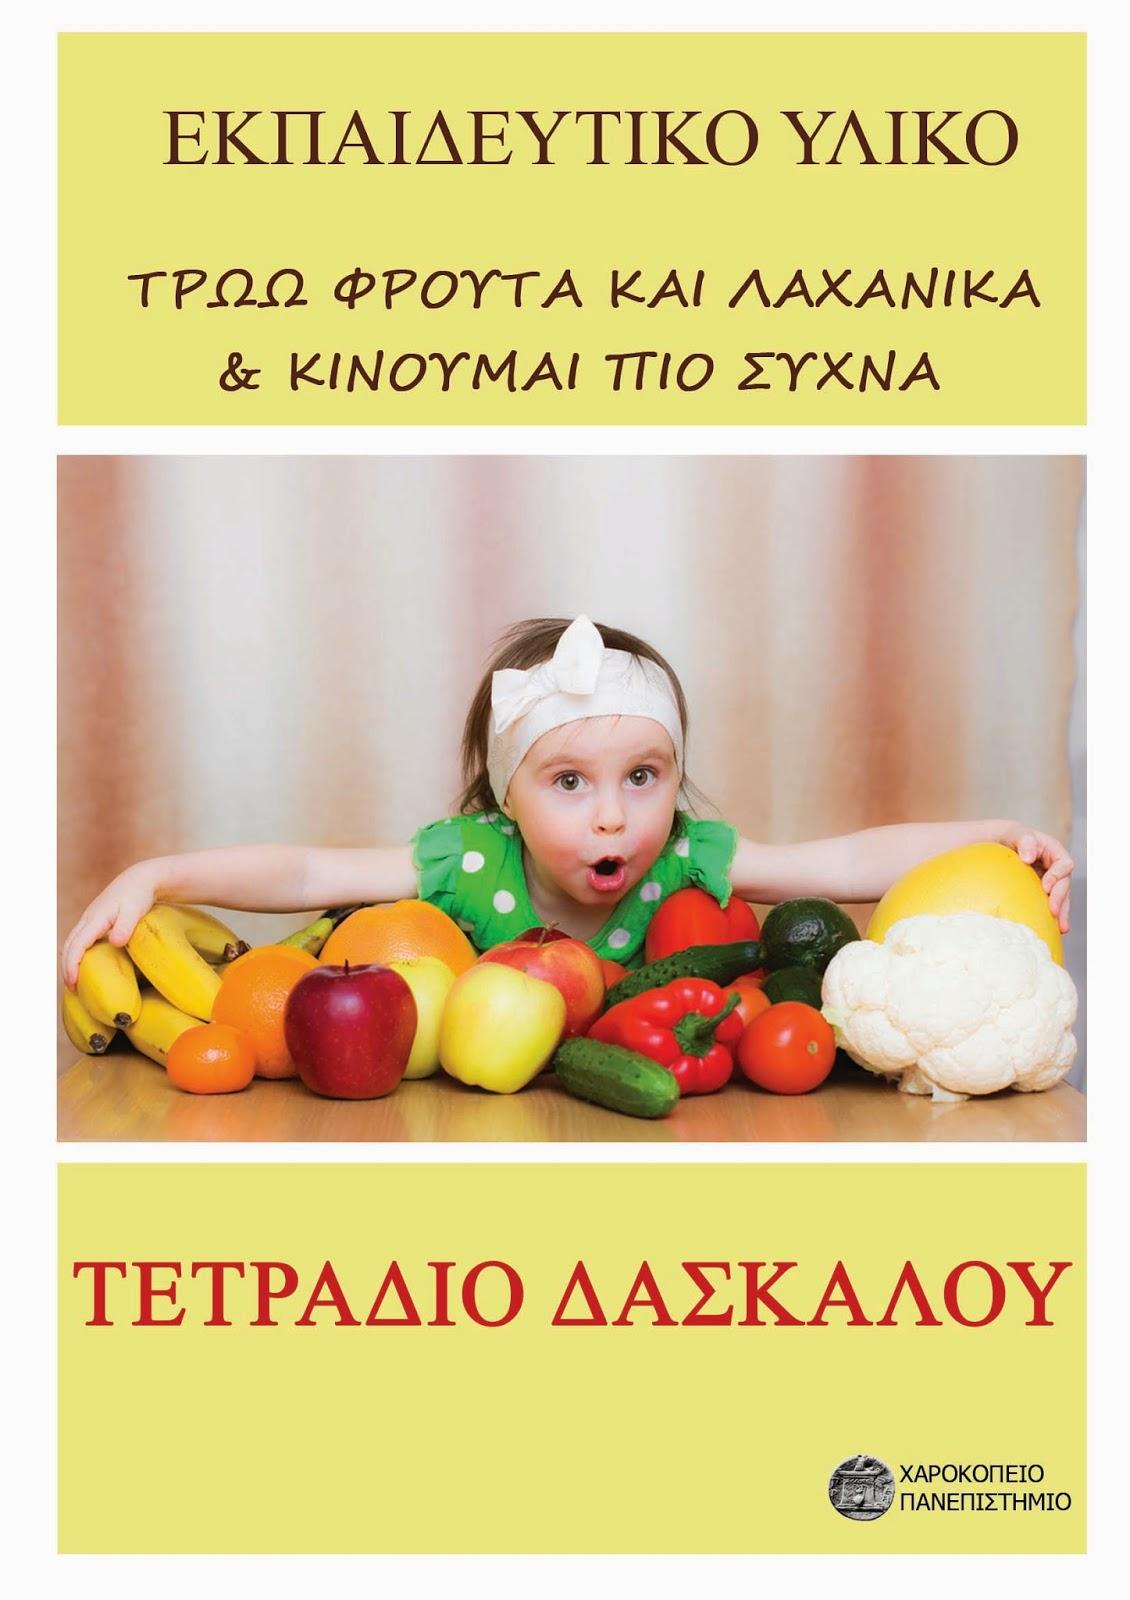 http://eyzin.minedu.gov.gr/Documents/Material_school/2nd%20Material_TeacherBook.pdf